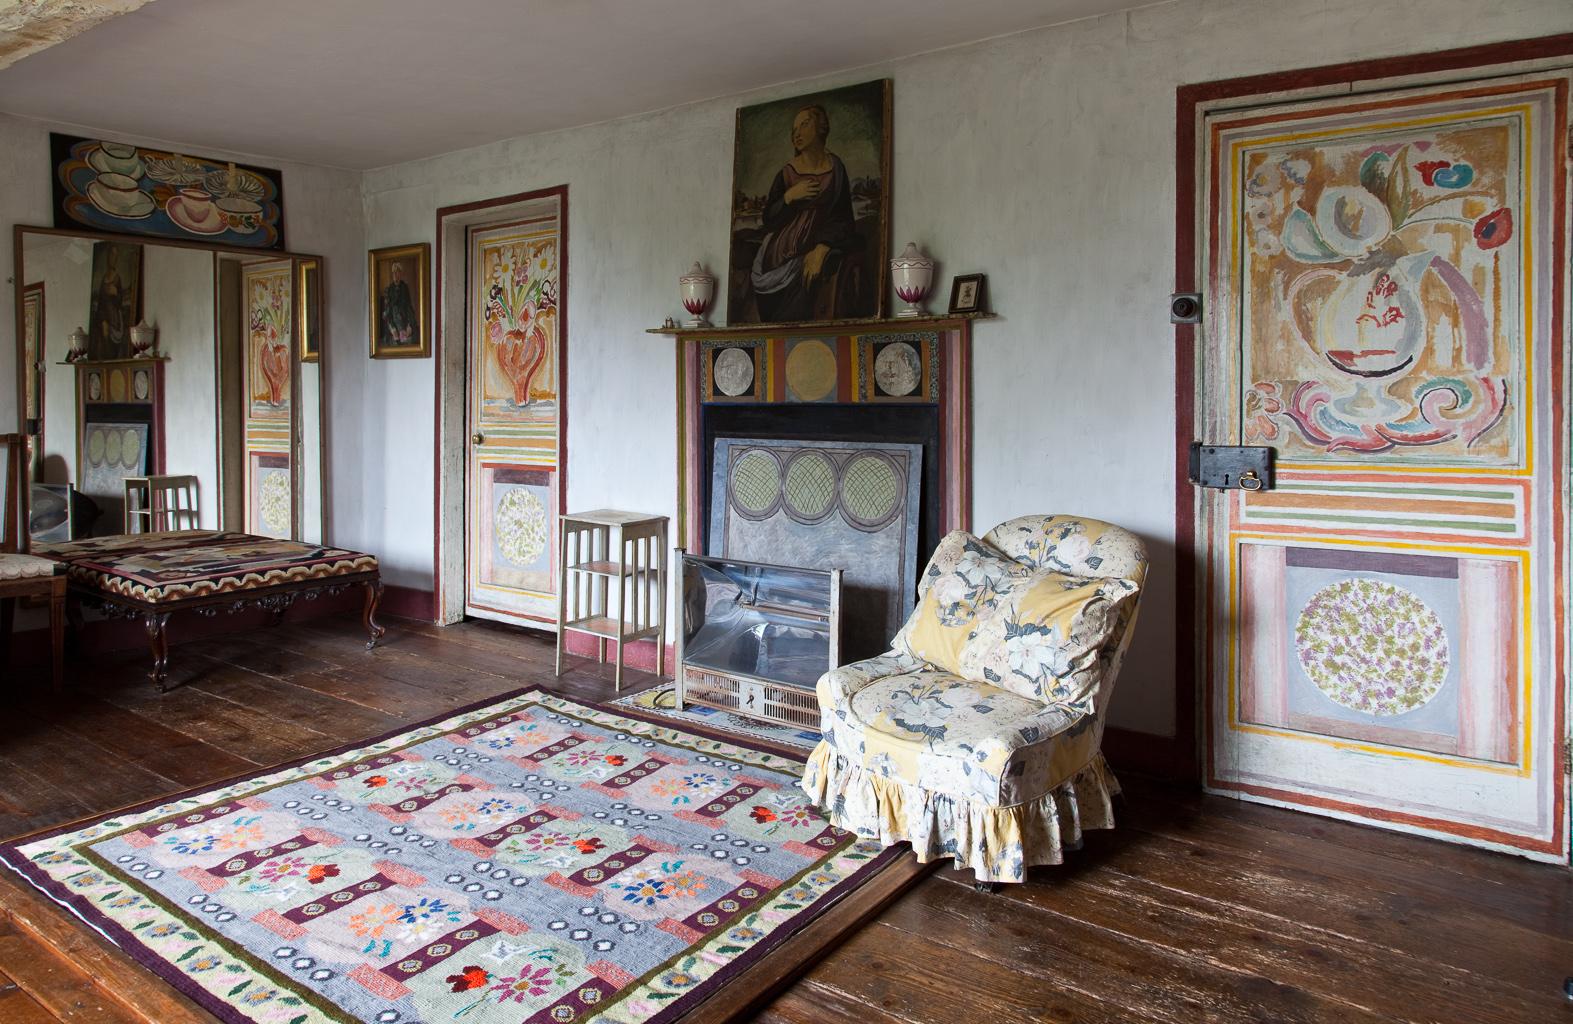 Heals-bloomsbury-group-charleston-house